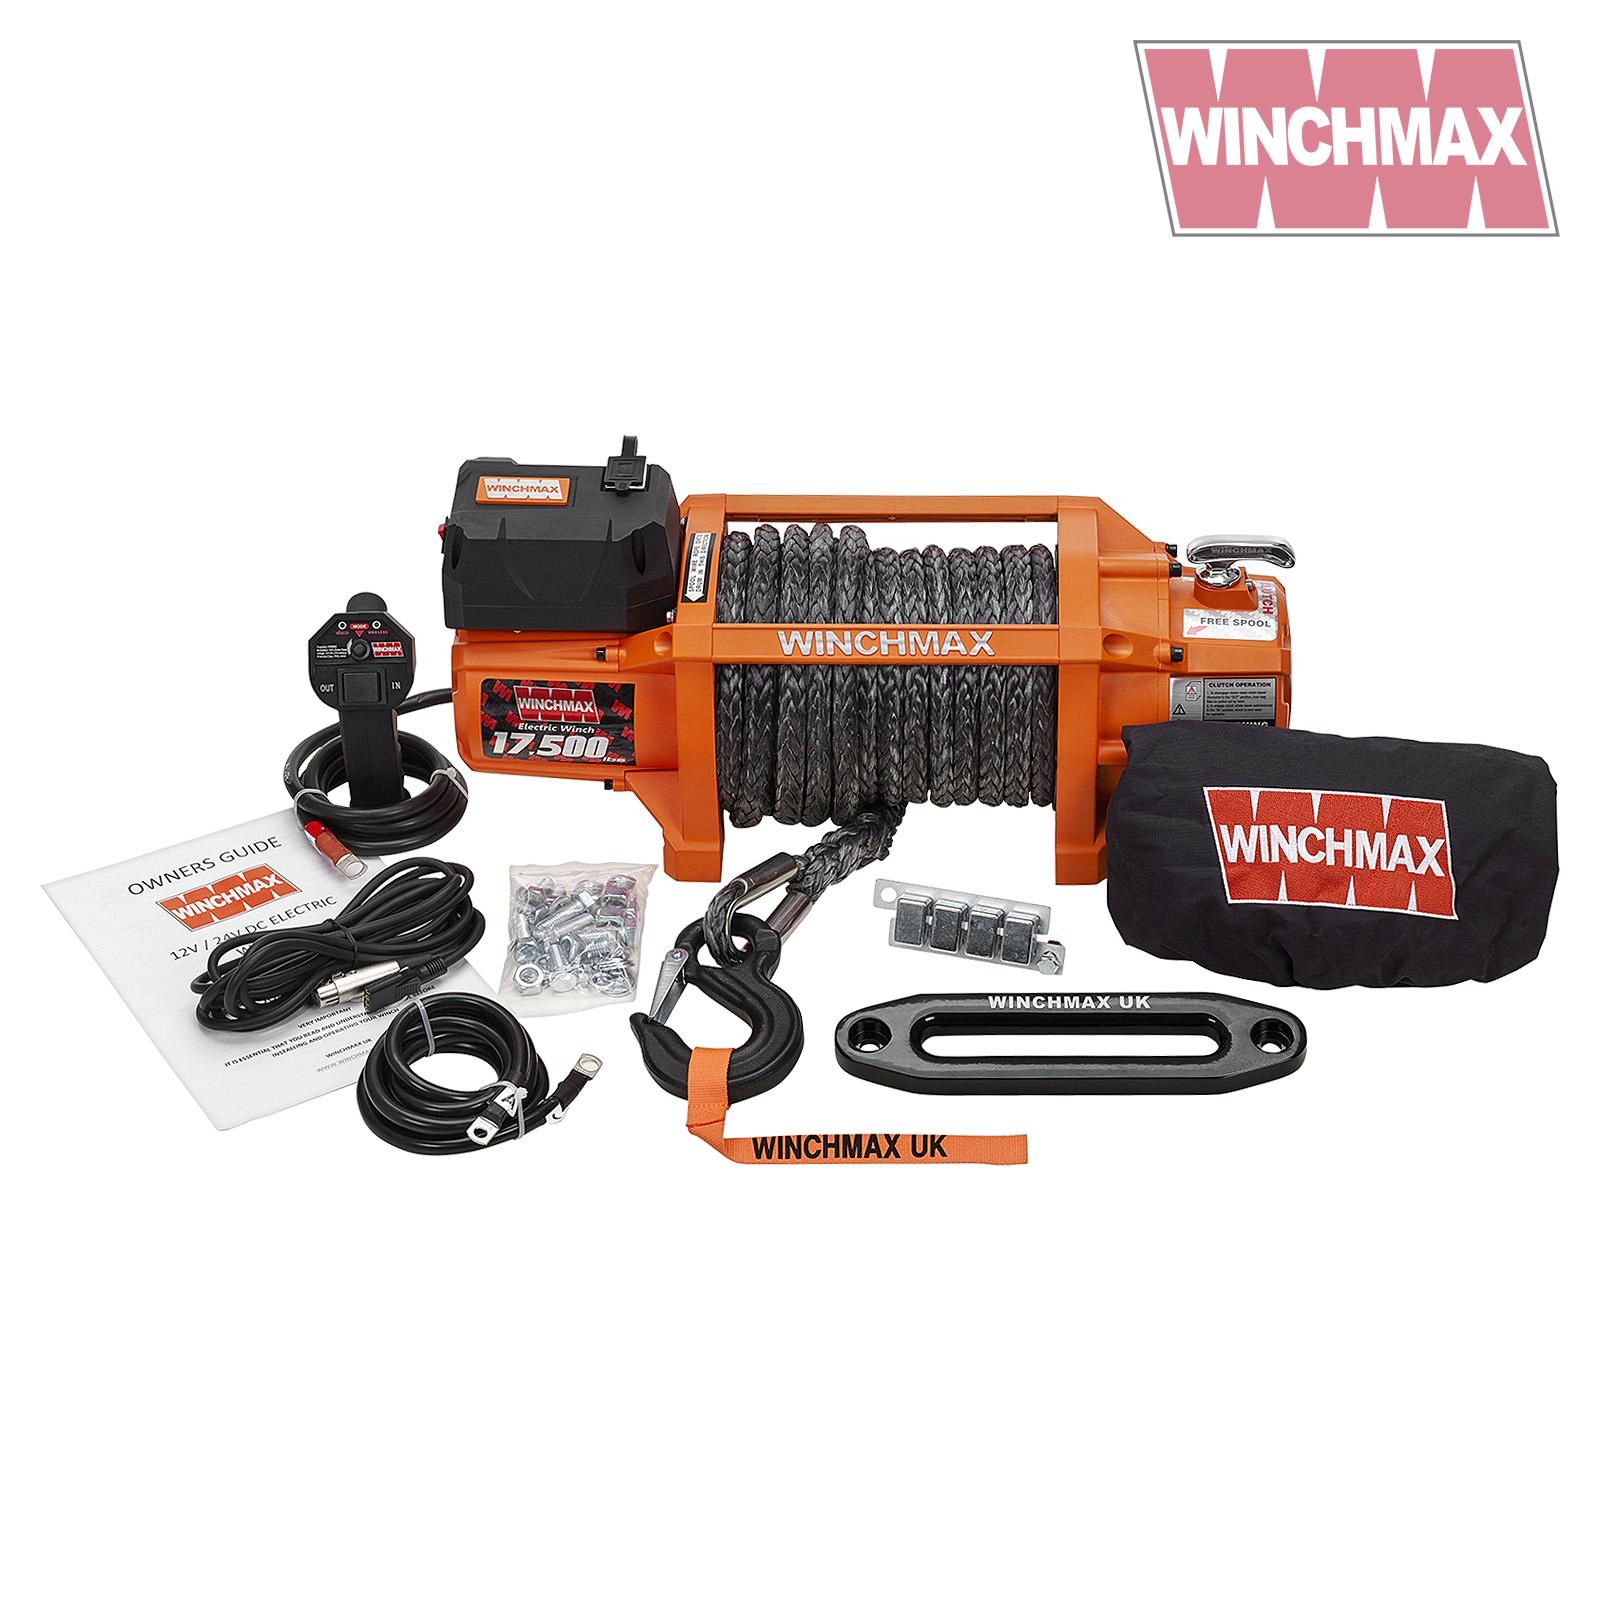 Wmsl1750012vsyn winchmax615198959 voltage removed white 14